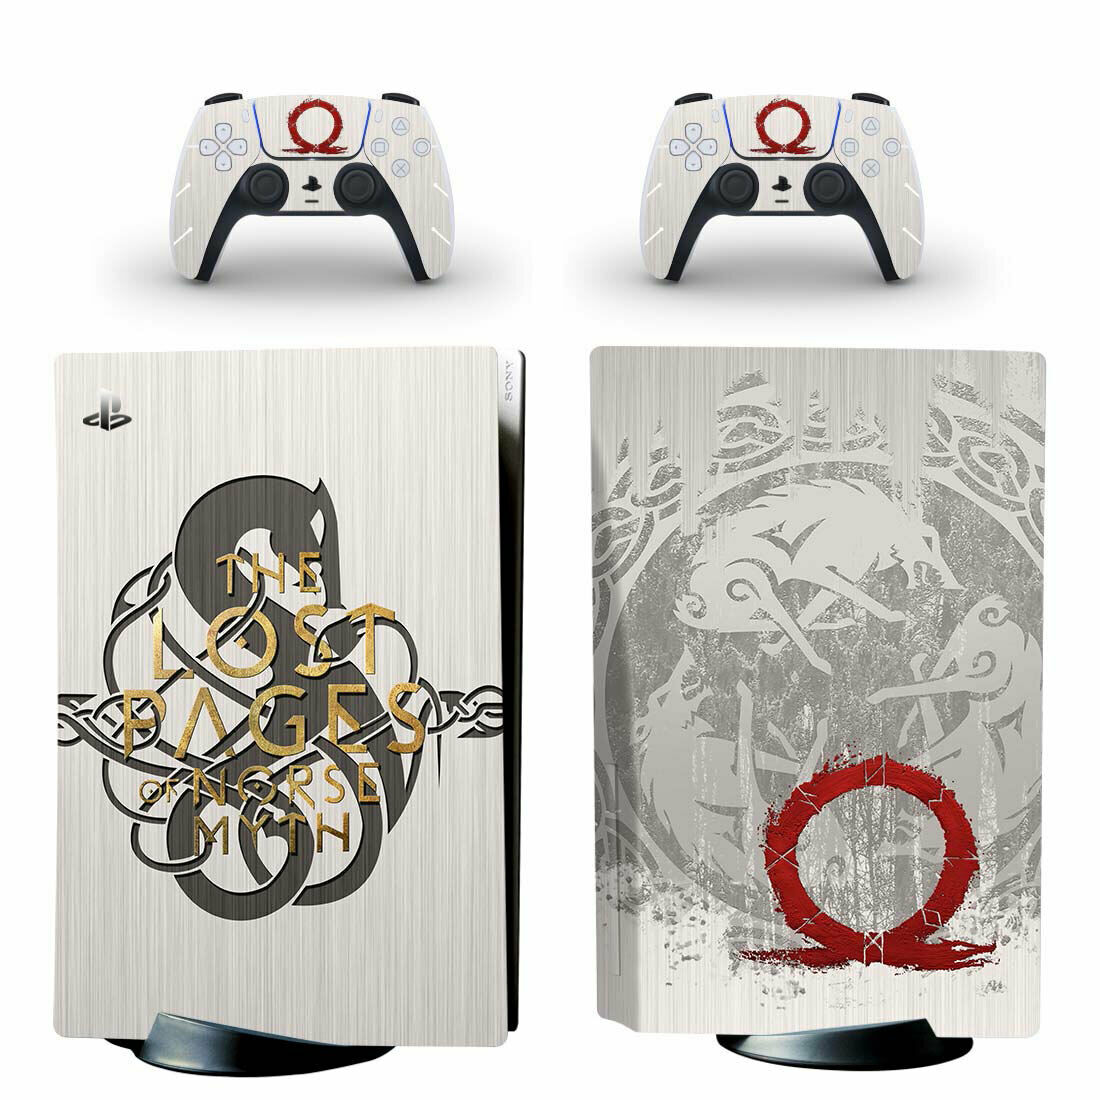 God of War Vinyl Decal Skin Sticker Full Set for PS5 PlayStation 5 Disc Version